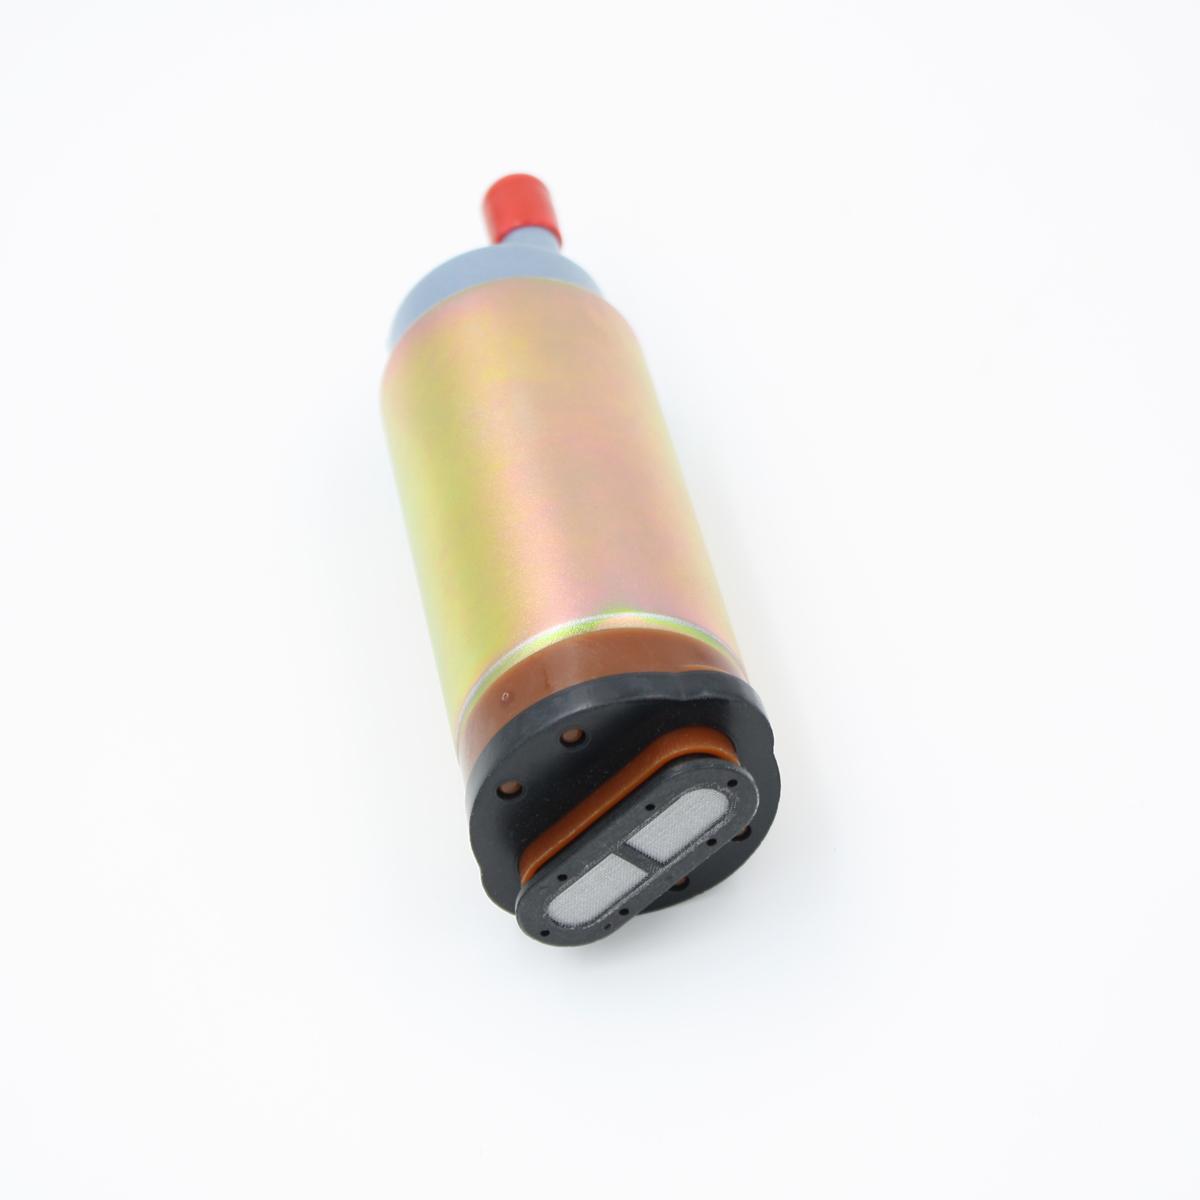 New ELECTRIC FUEL PUMP fits Mercury Outboard 2009 1A6C411KZ 1A6C413KZ 1E60413KZ